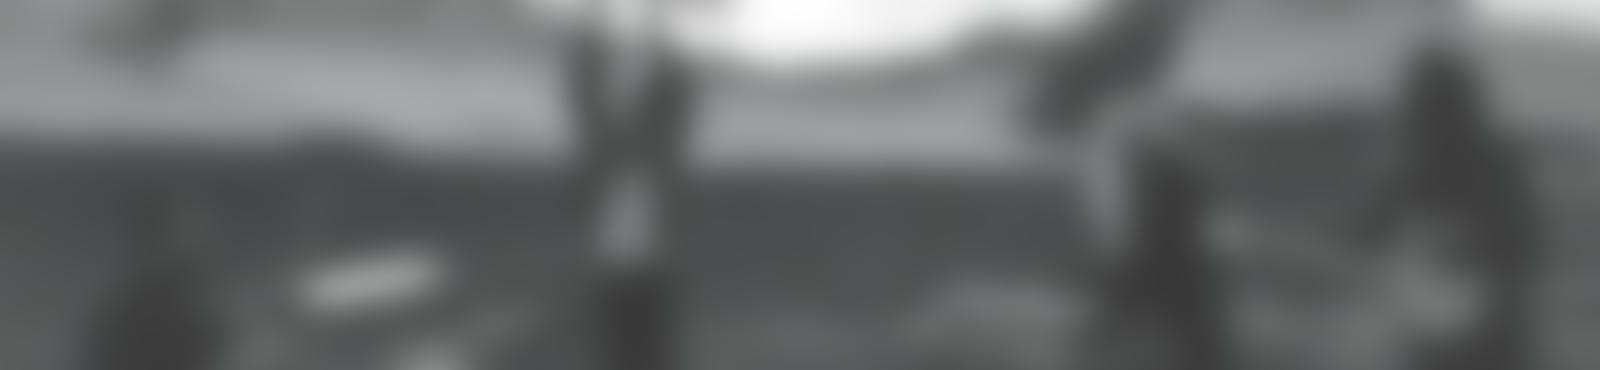 Blurred c0014a27 5aef 415a a520 88aa72dcf2bd